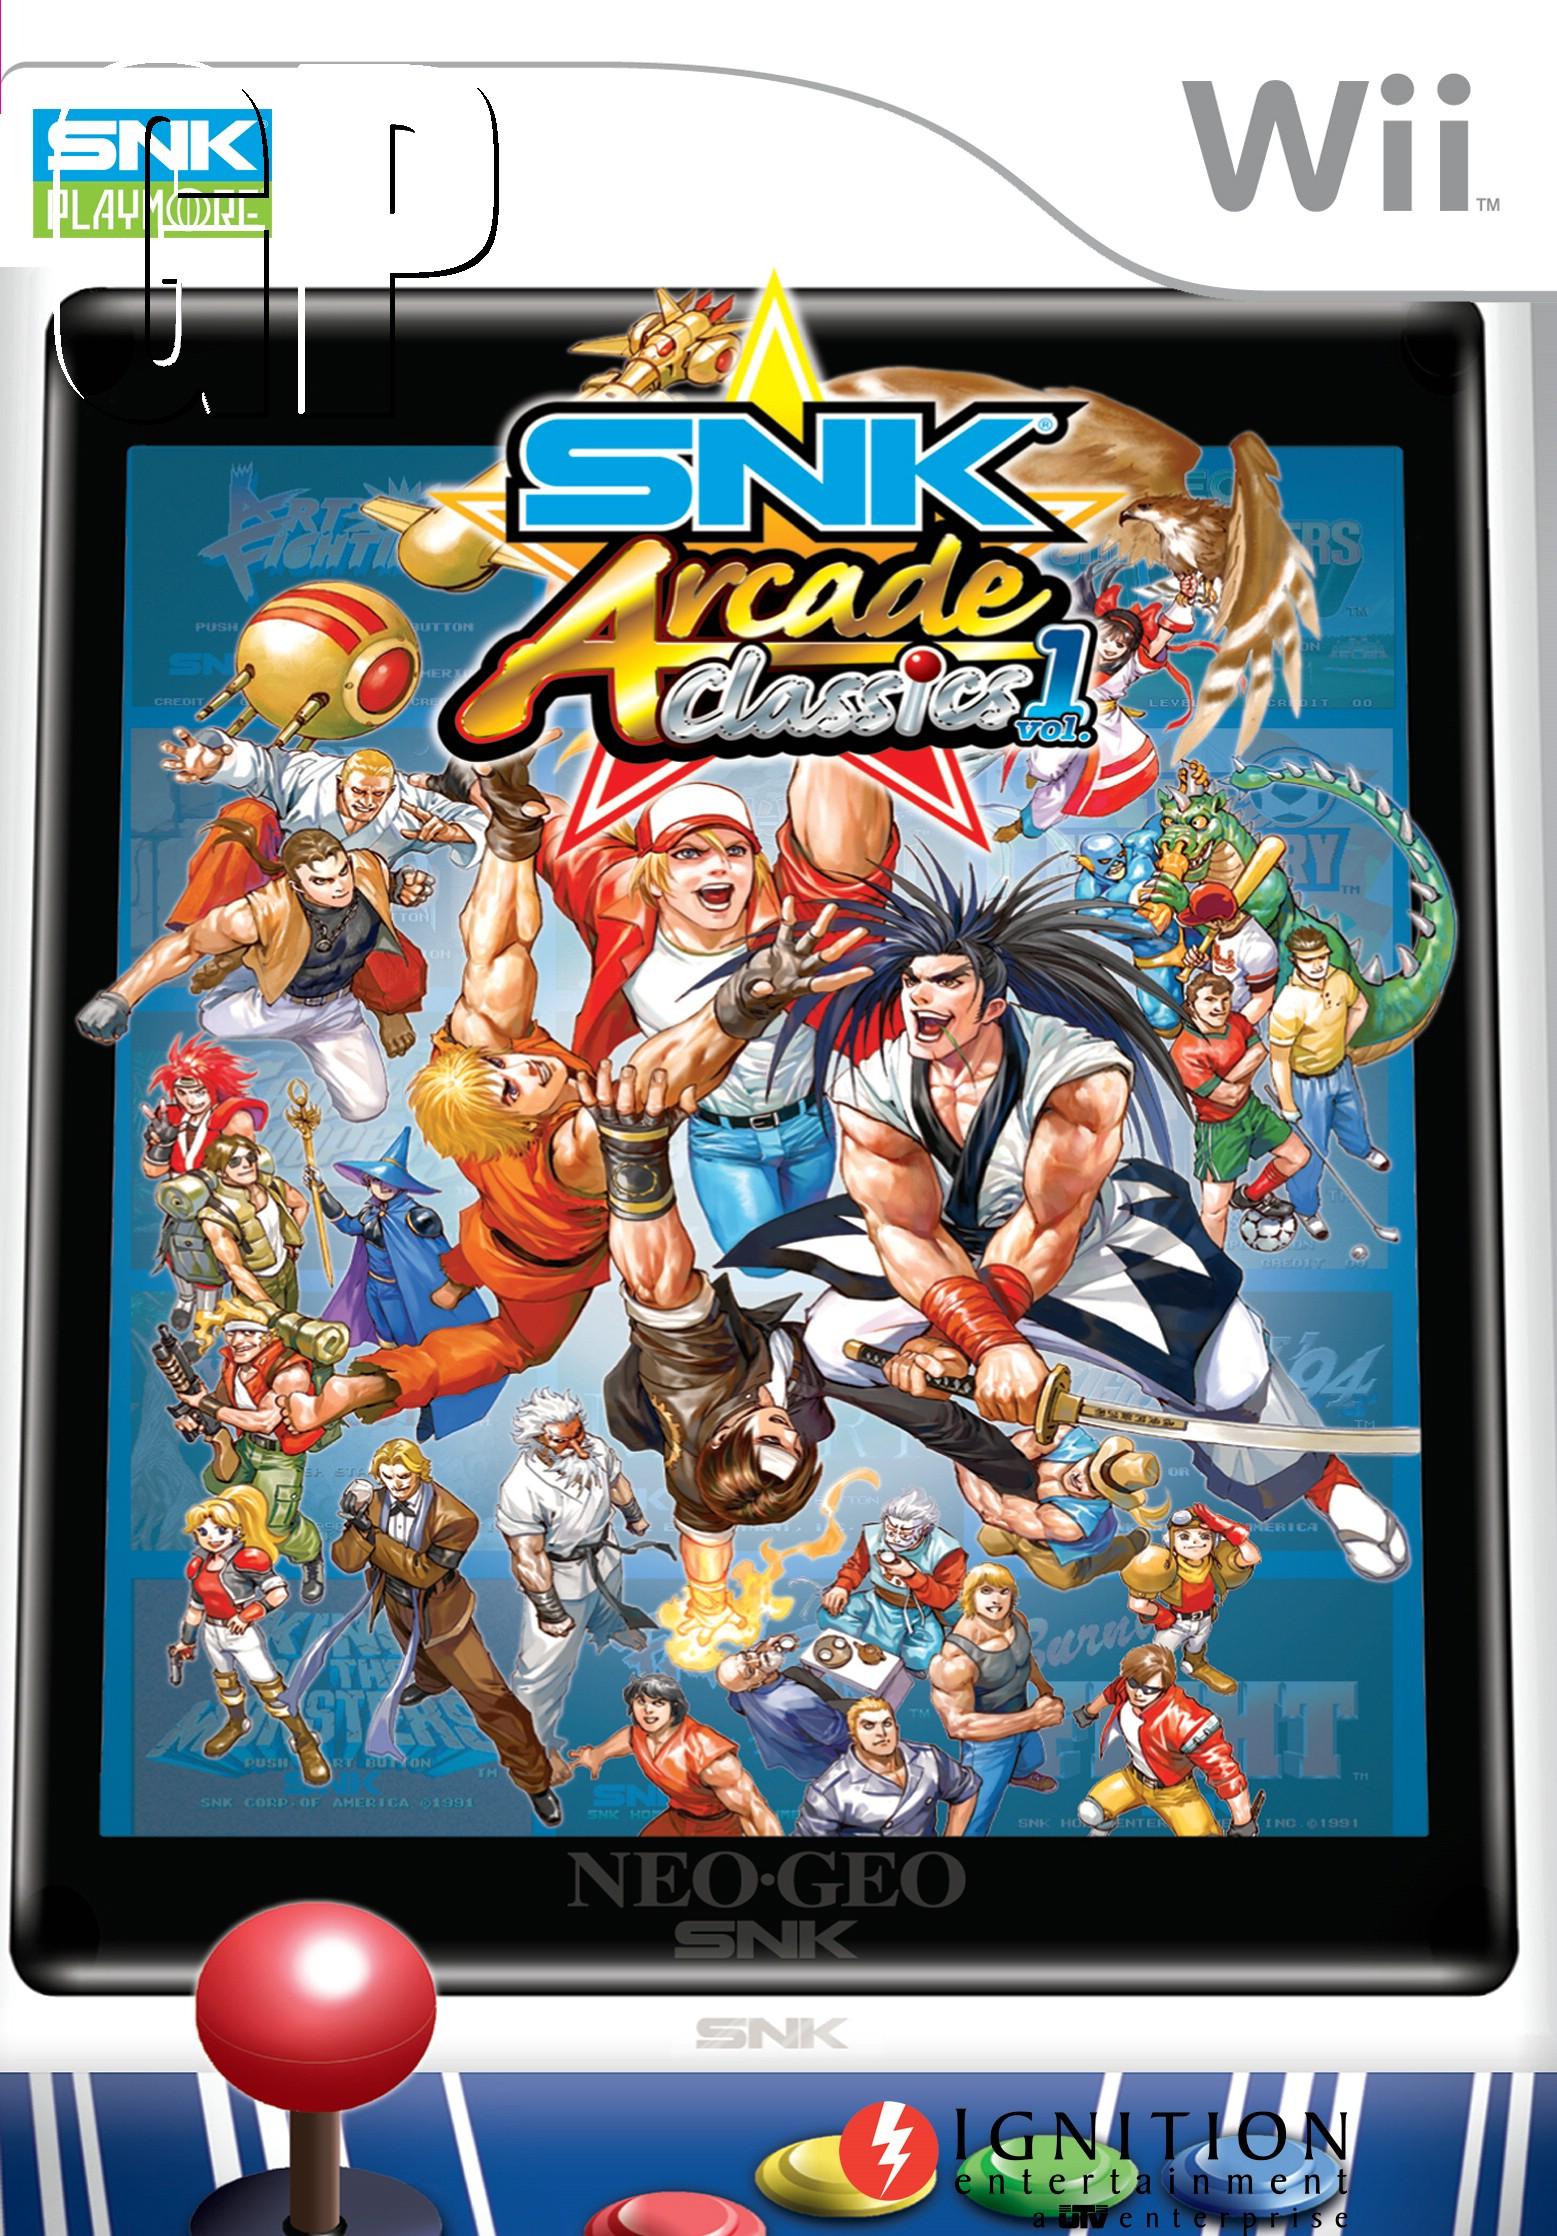 SNK Arcade Classics: Volume 1 Boxart (UK)